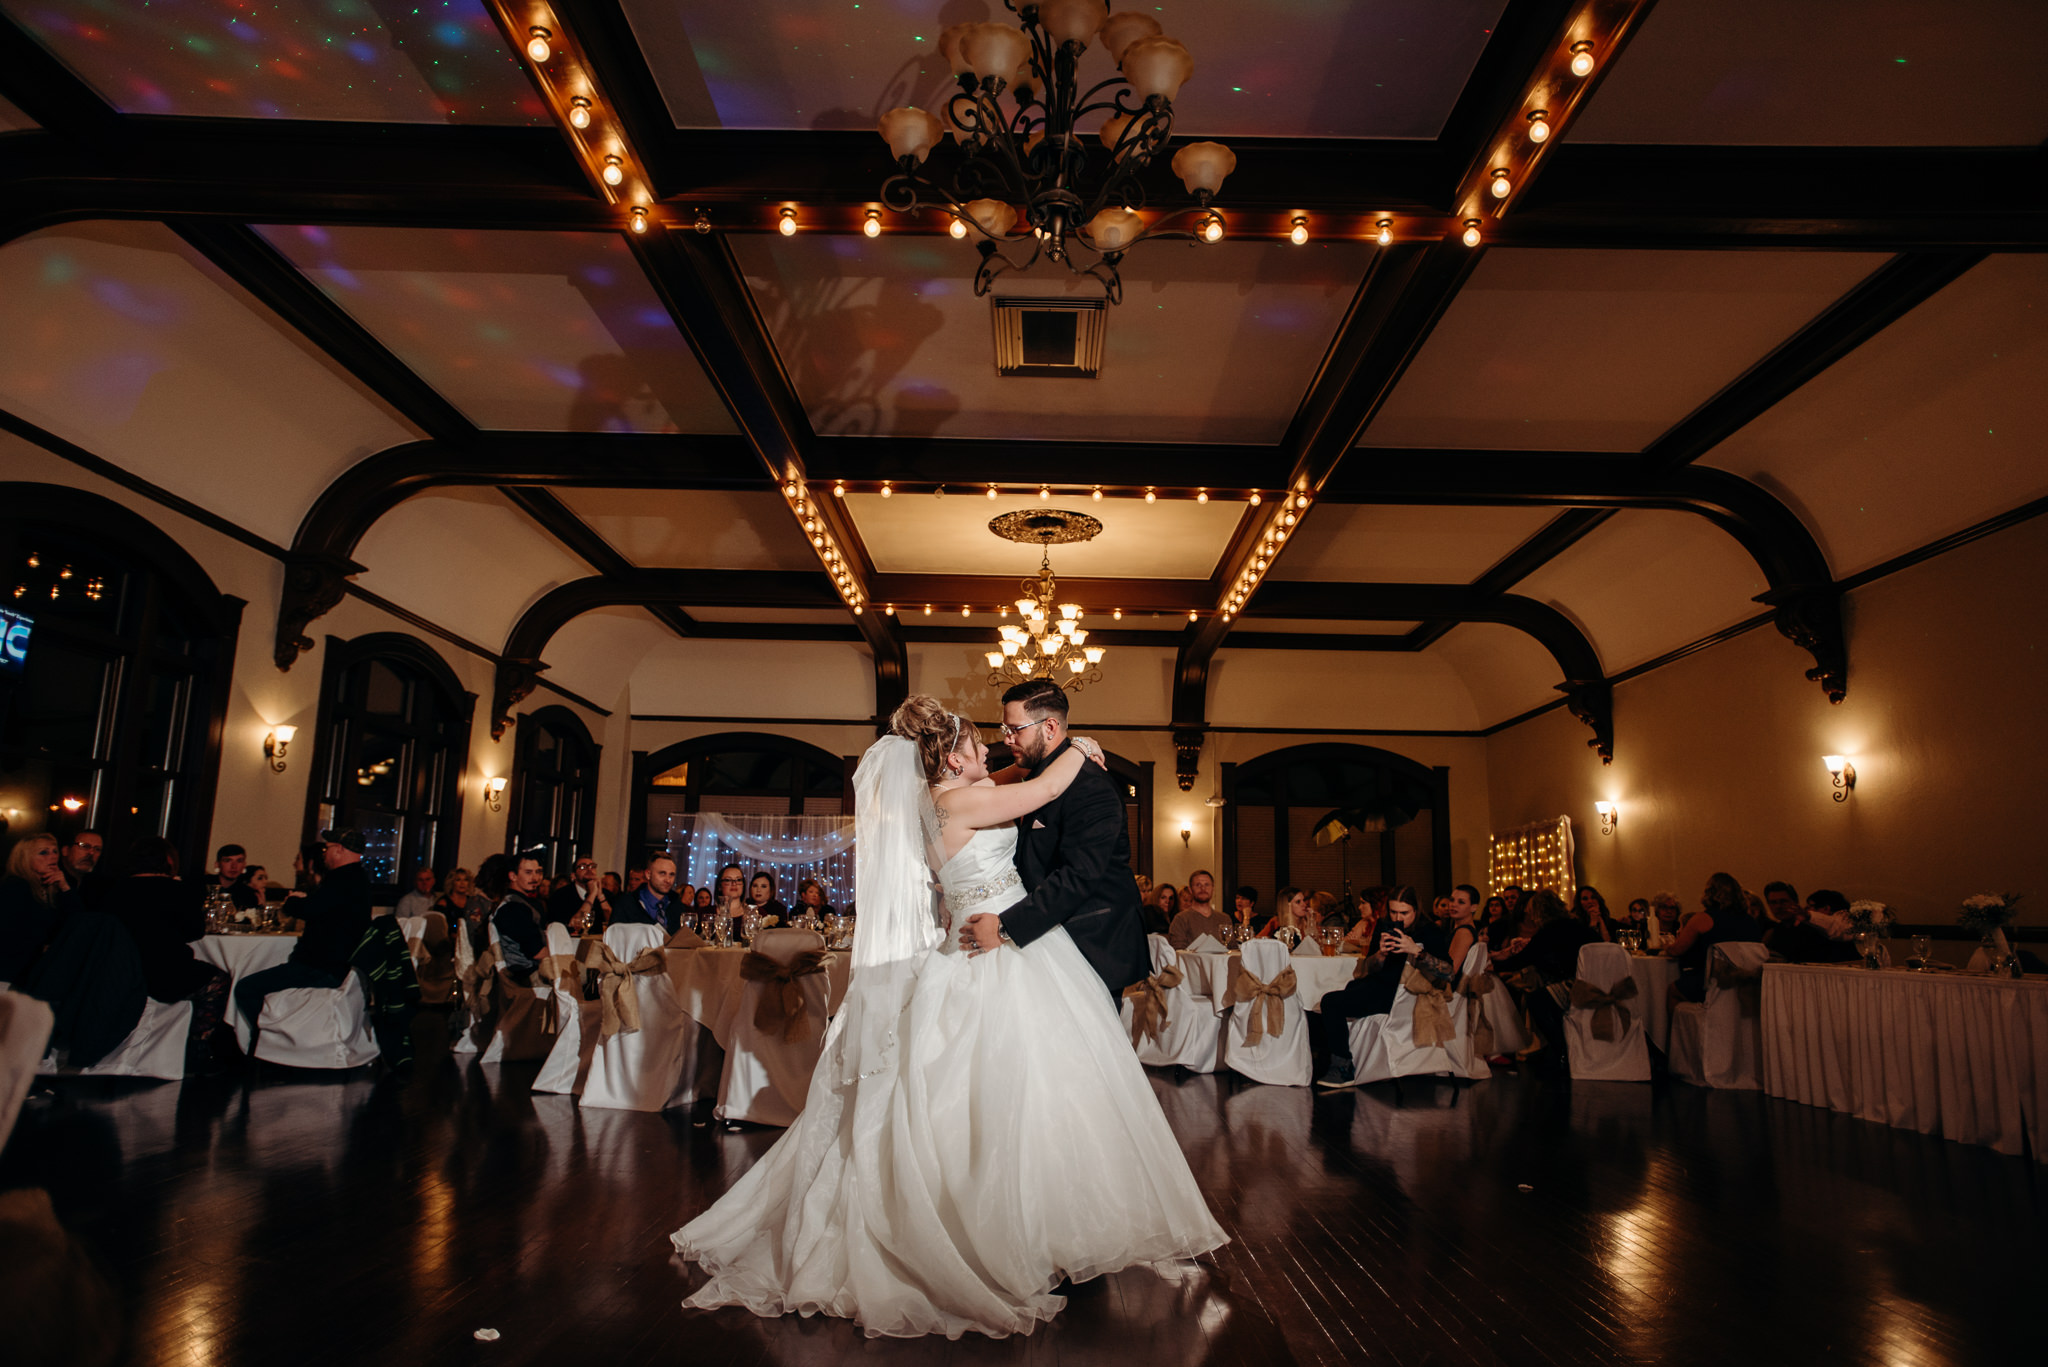 Grant Beachy Photo portrait wedding goshen elkhart south bend chicago-046.jpg